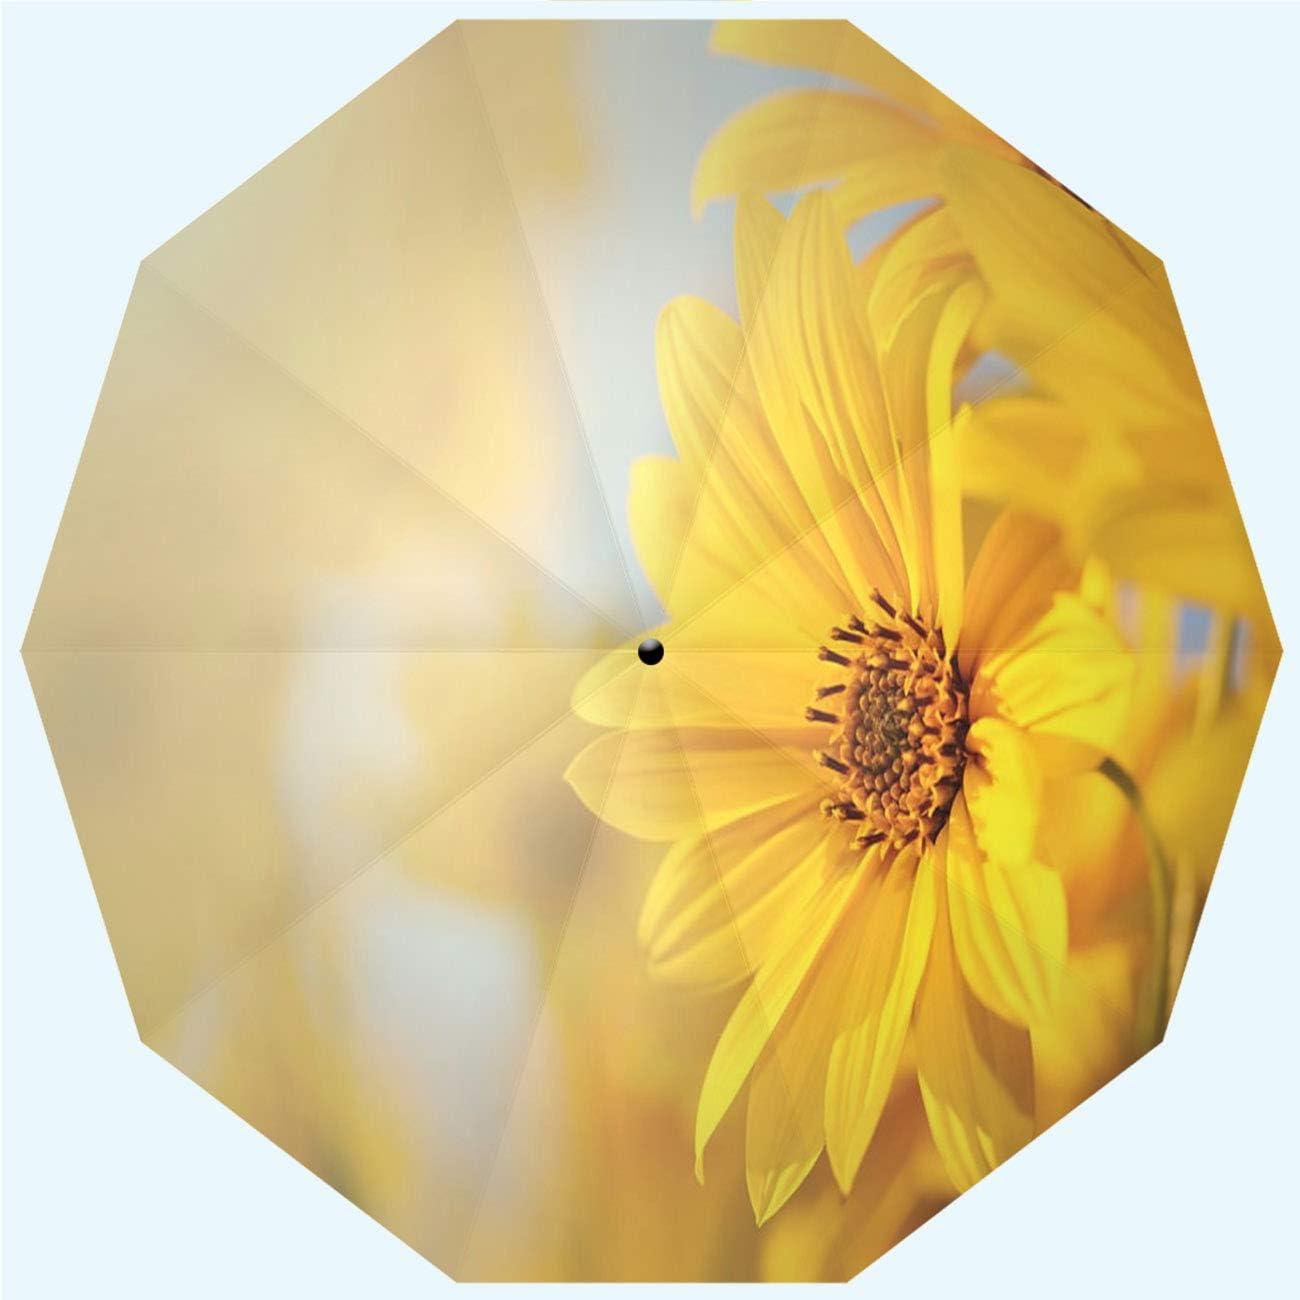 RLDSESS Surprise price Vintage Travel Folding Umbrella and Opening Automatic Ranking TOP11 C